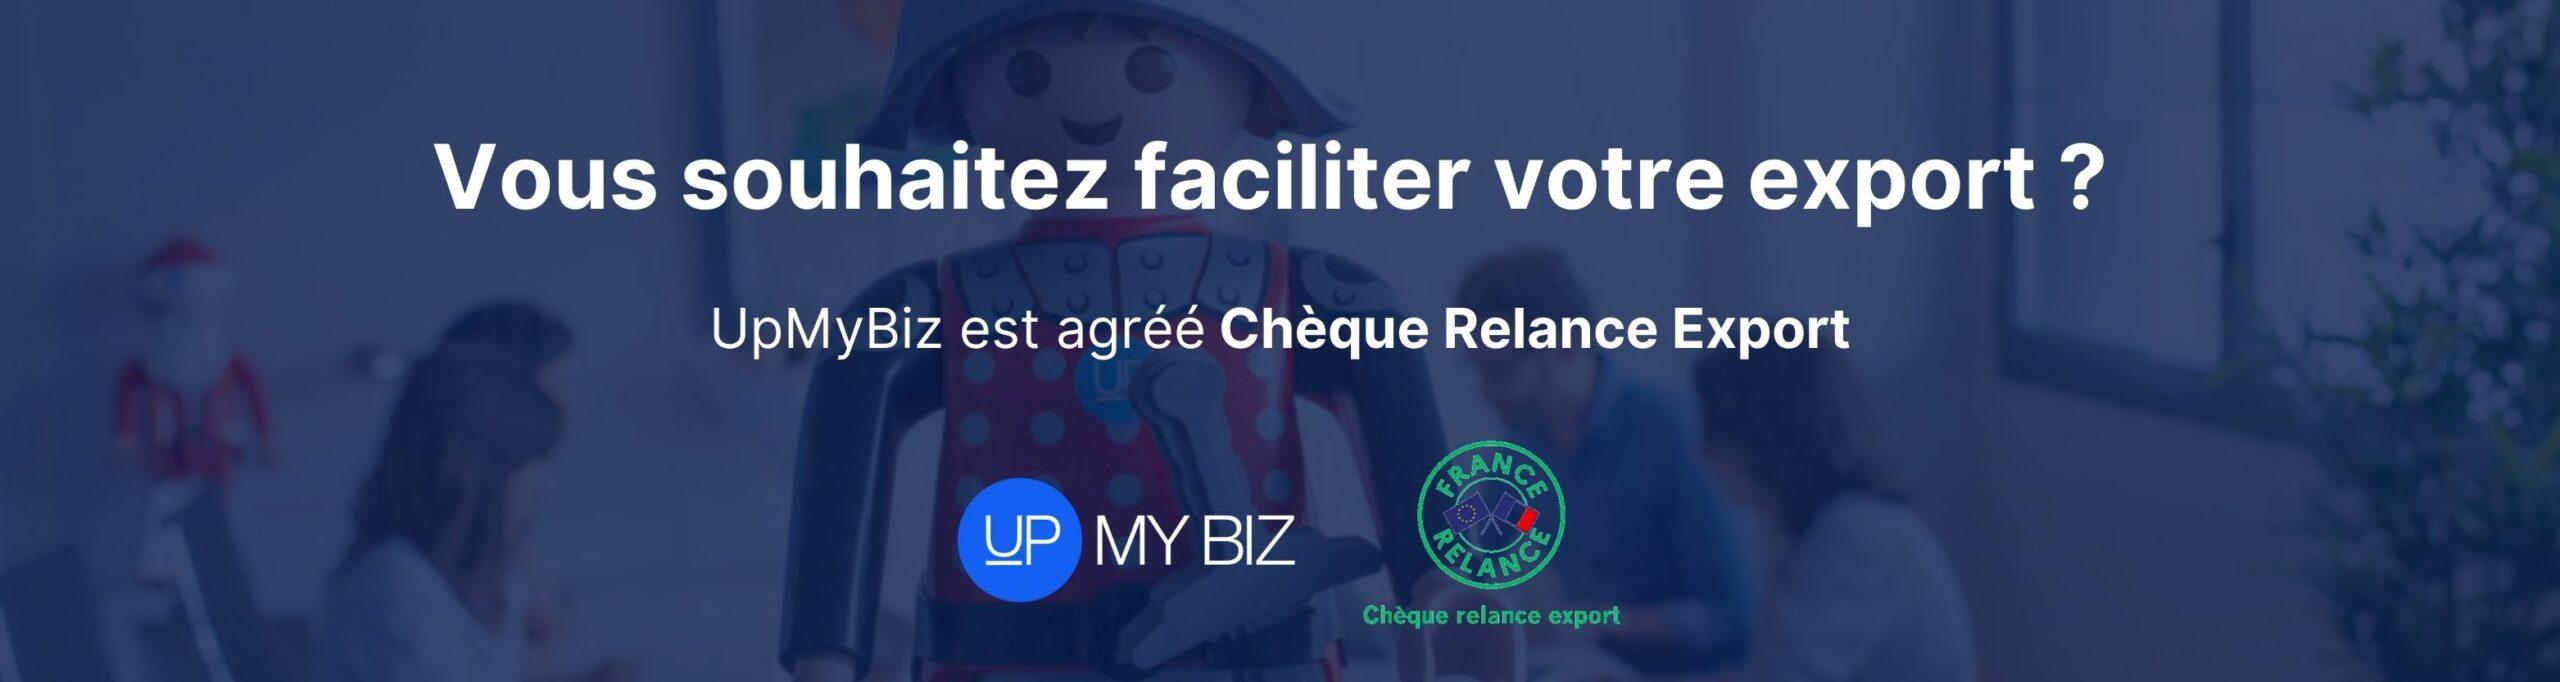 cheque relance export upmybiz